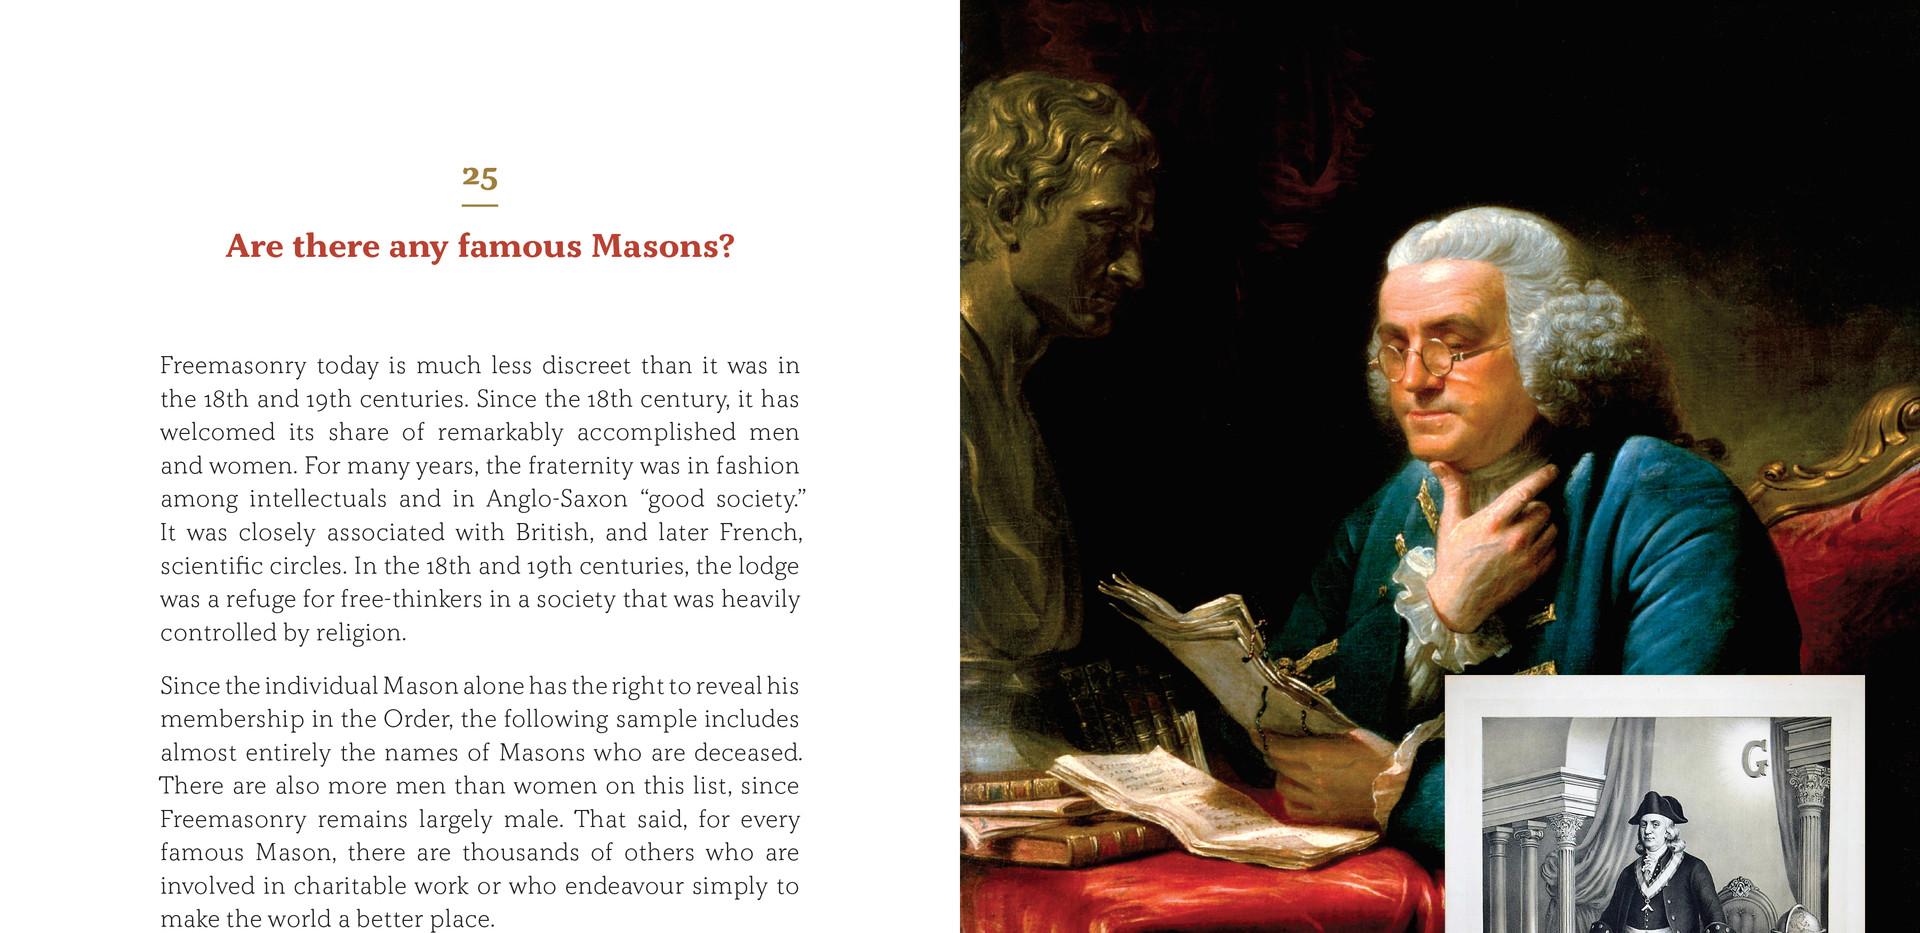 Freemasonry in 25 questions